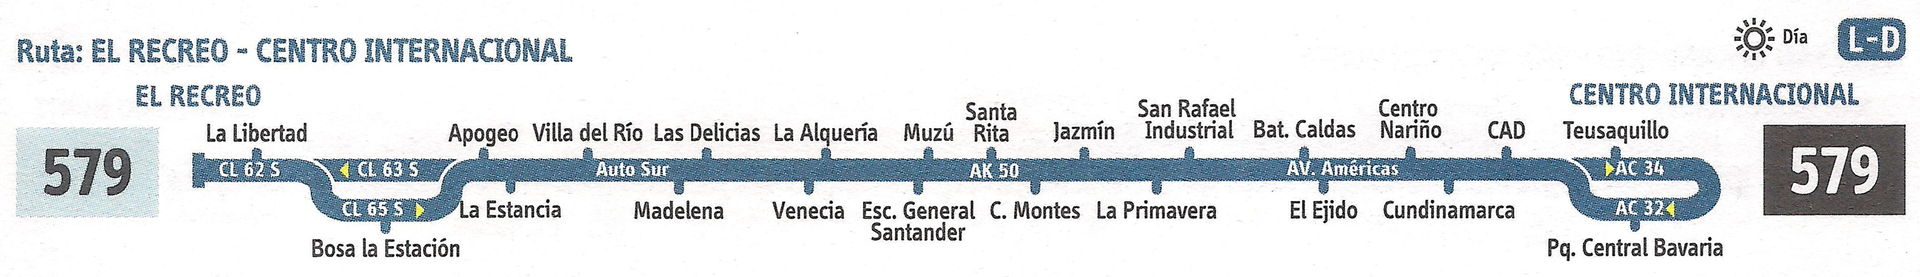 Ruta SITP: 579 El Recreo ↔ Centro Internacional [Urbana] 6